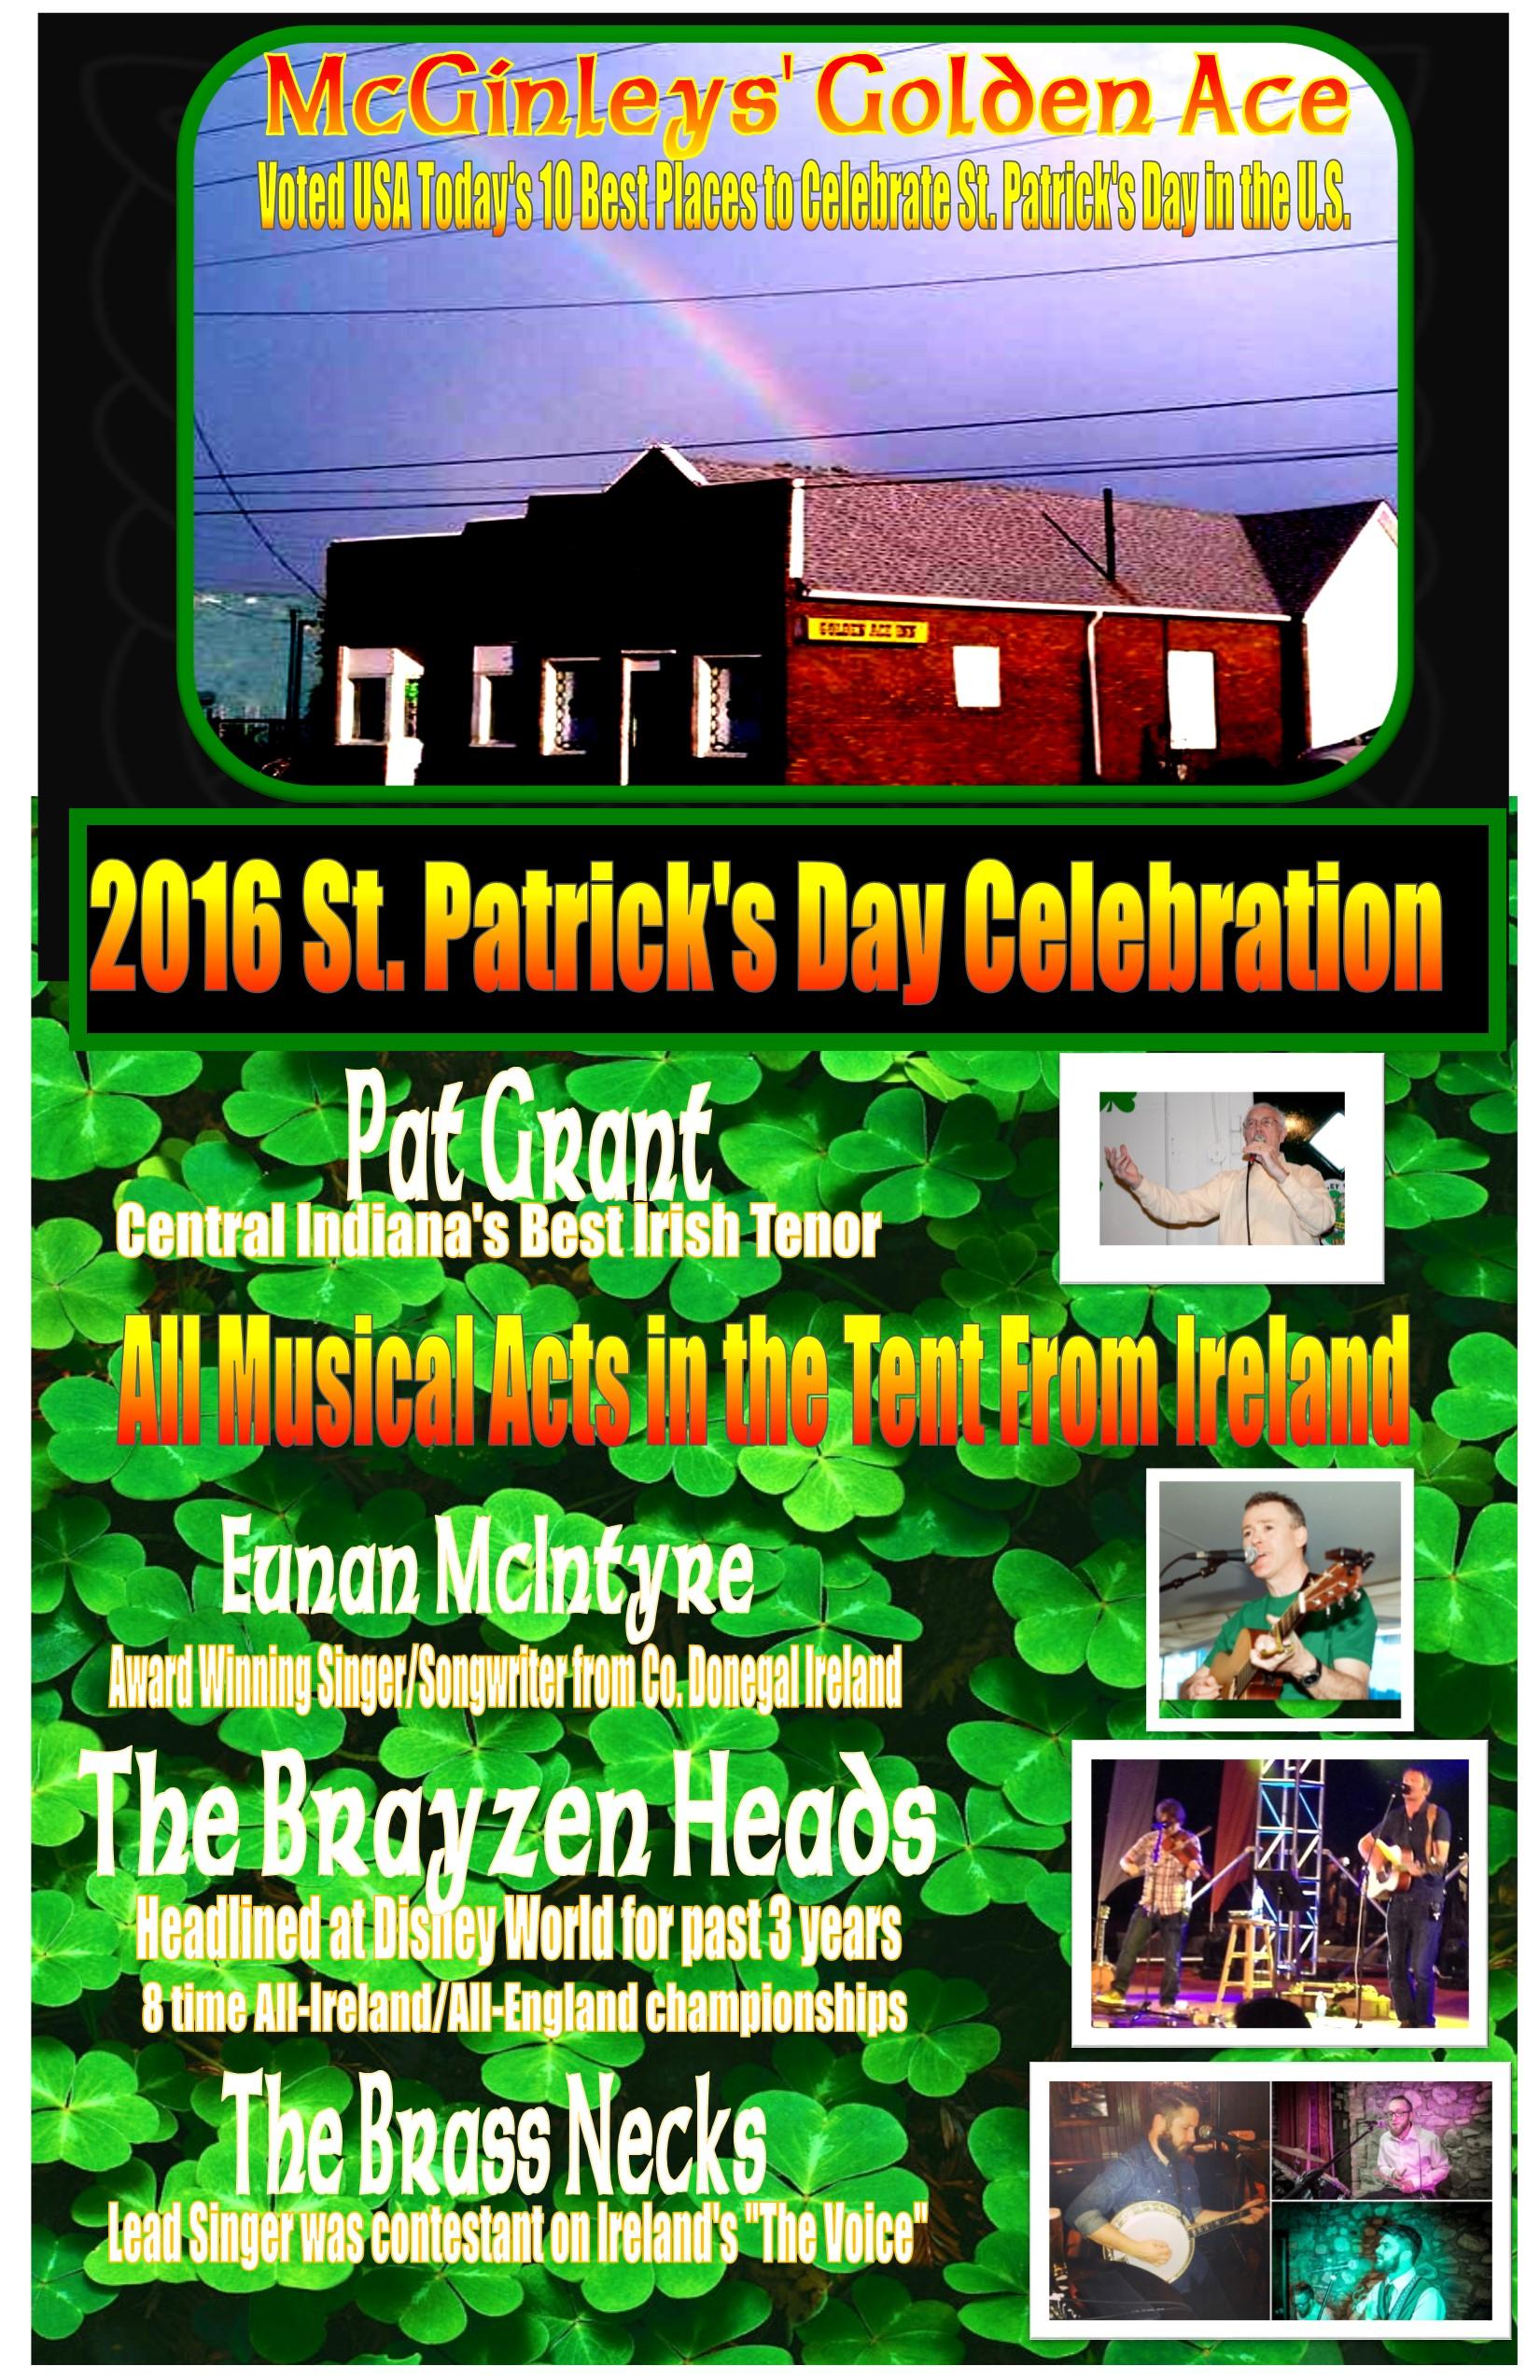 St. Patrick's Day 2016!